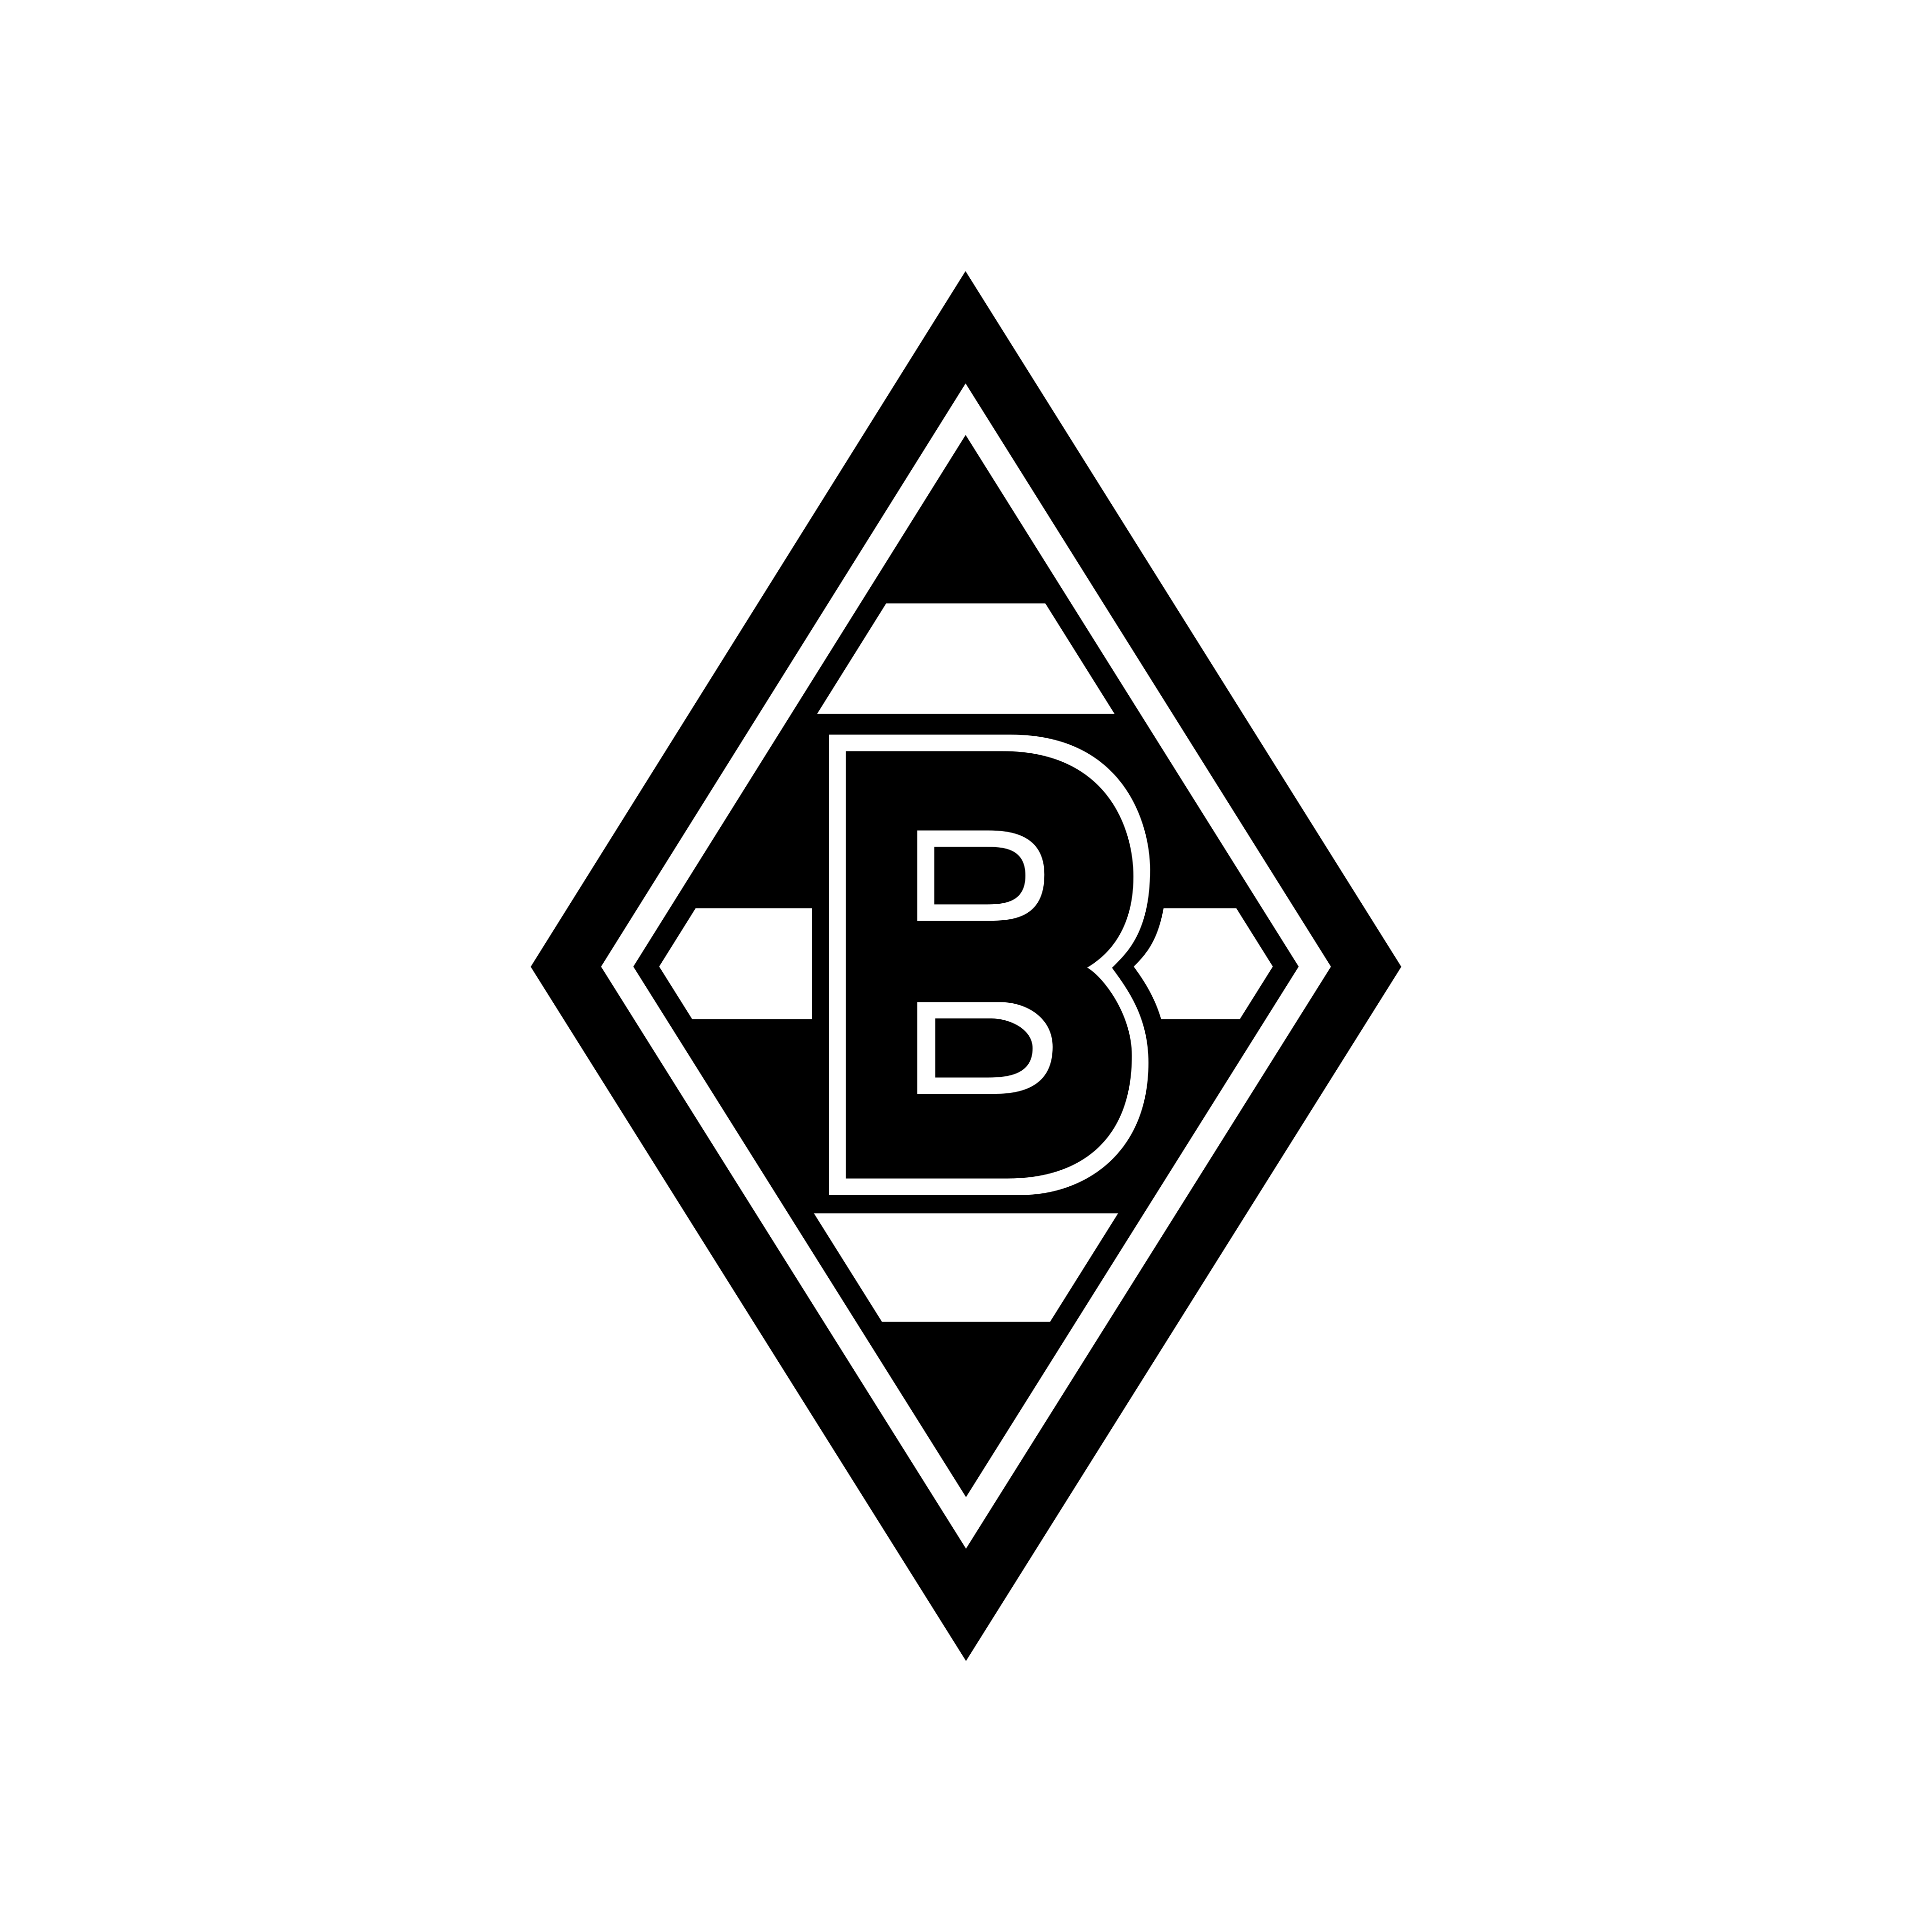 borussia monchengladbach logo 0 - Borussia Mönchengladbach Logo